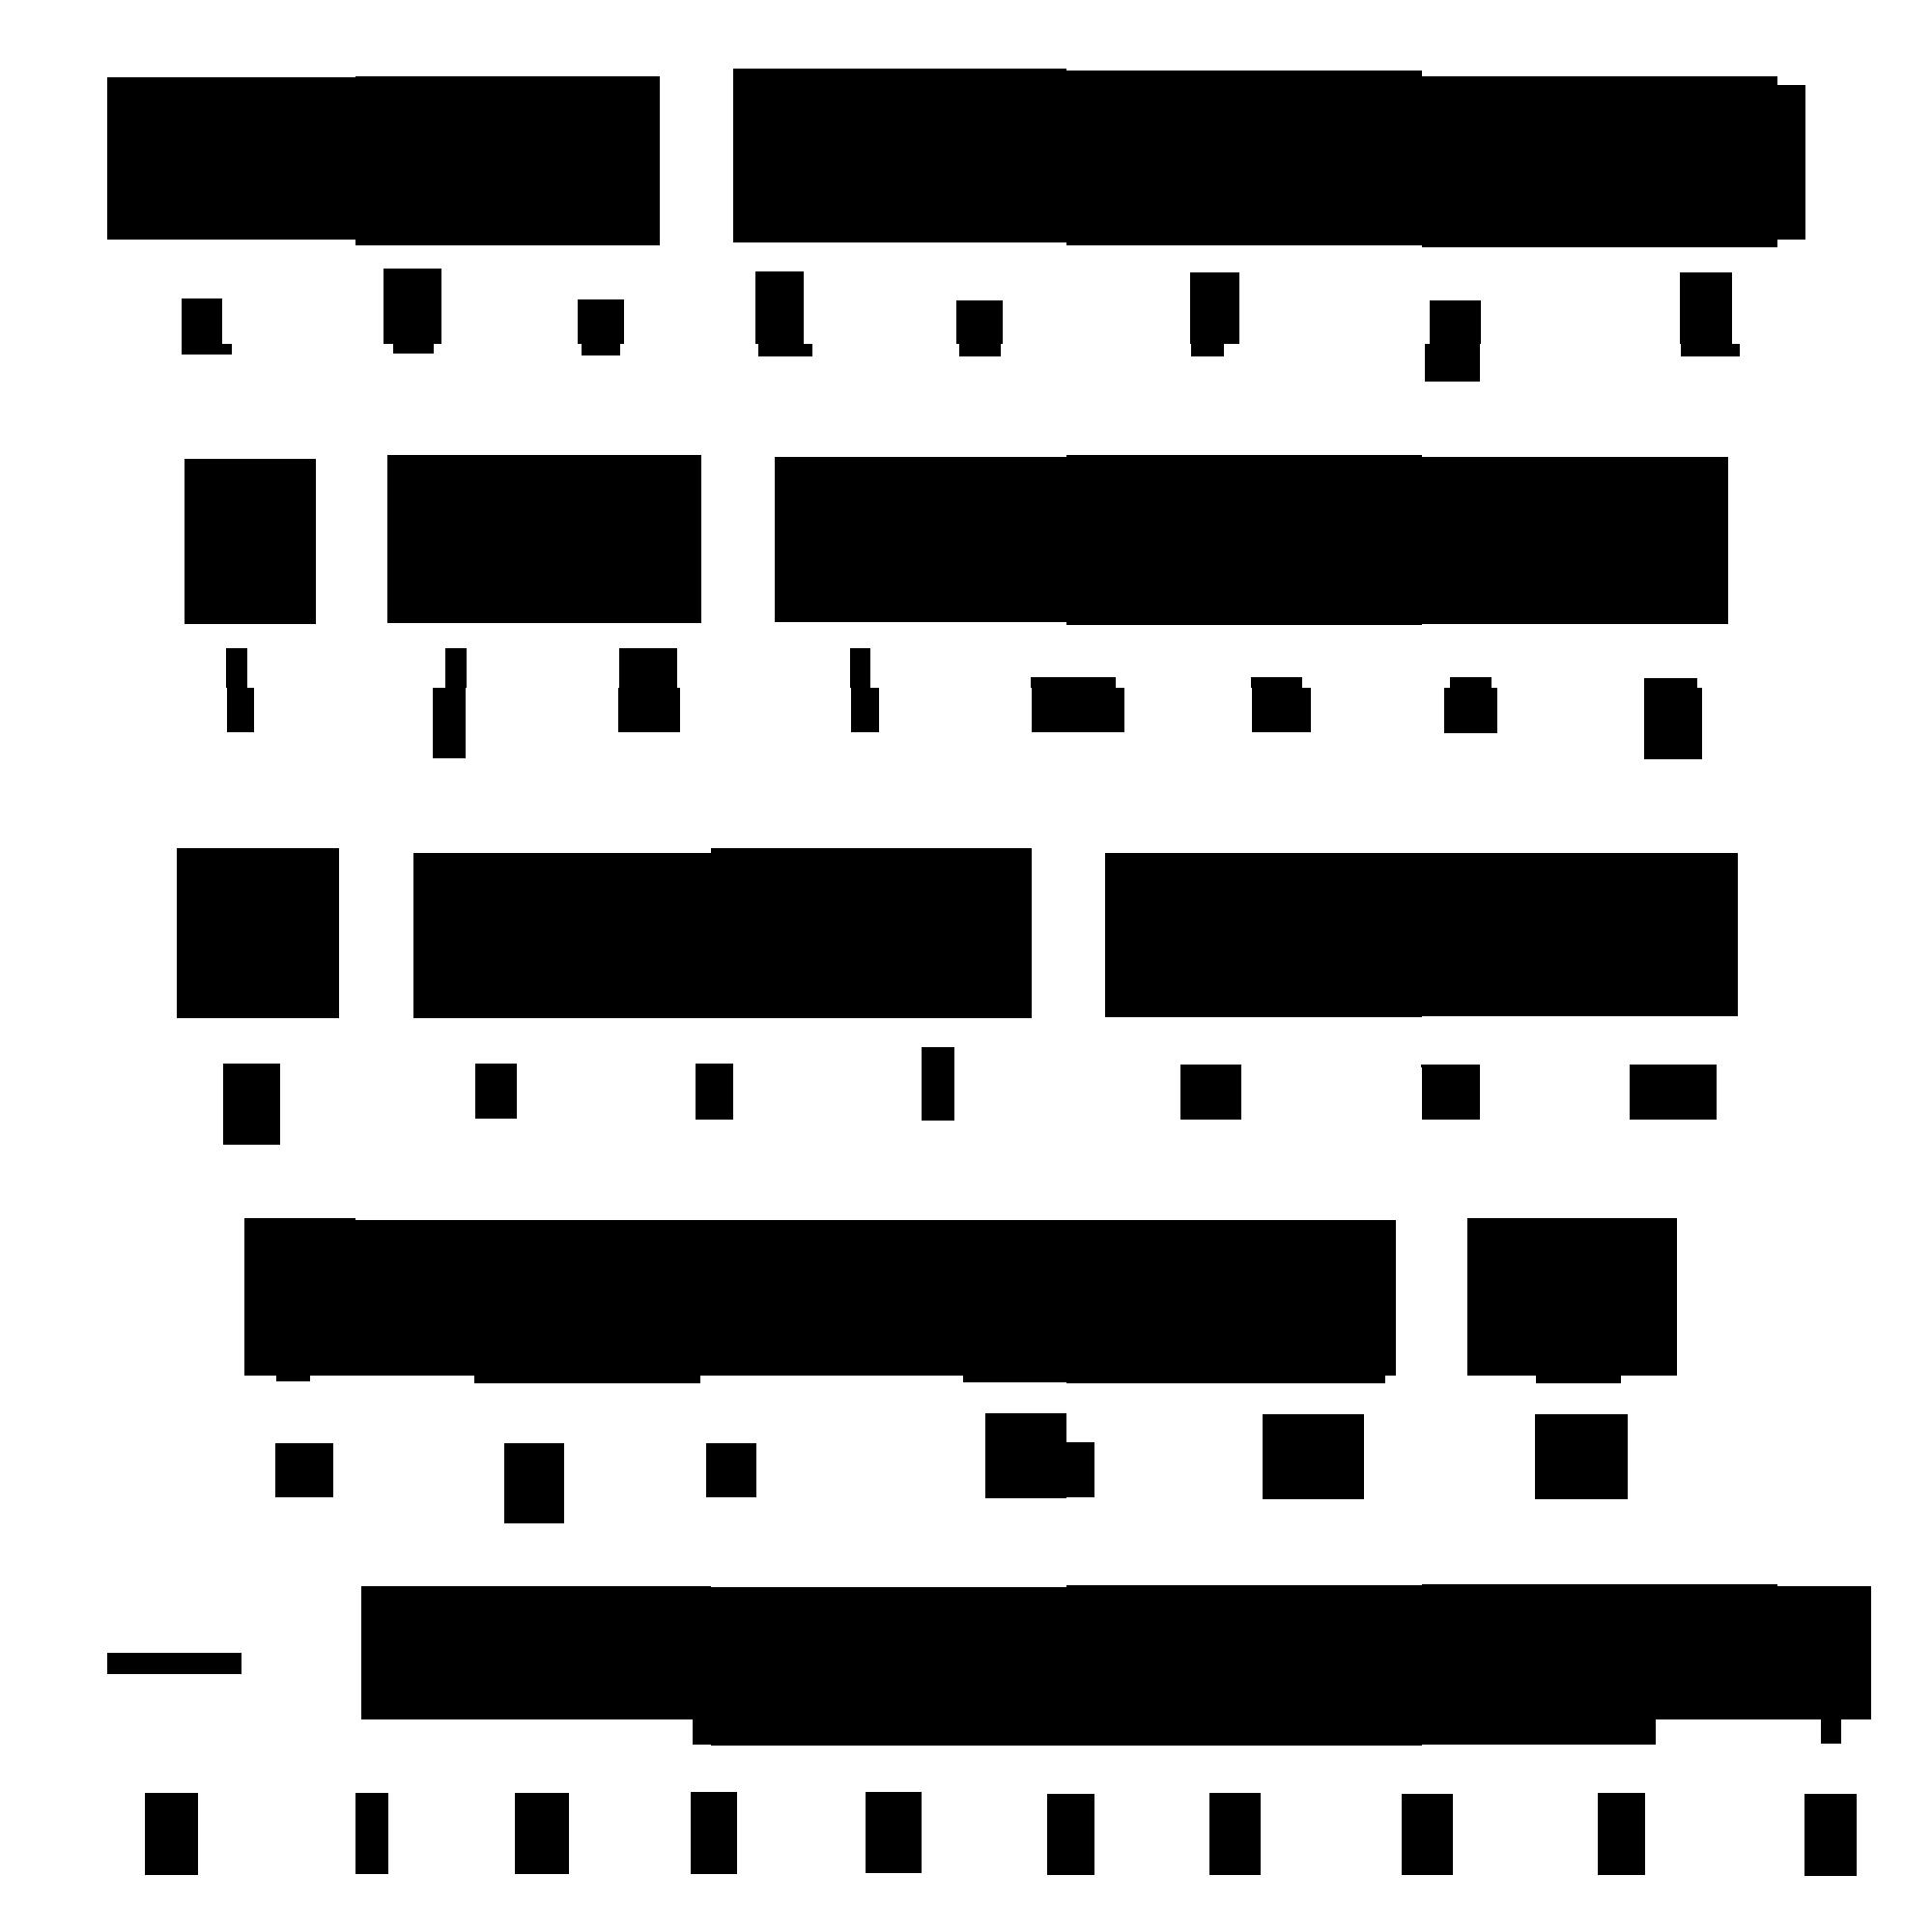 Afficher l 39 image d 39 origine objet pinterest atlantide disney et alphabet - Lettre disney ...